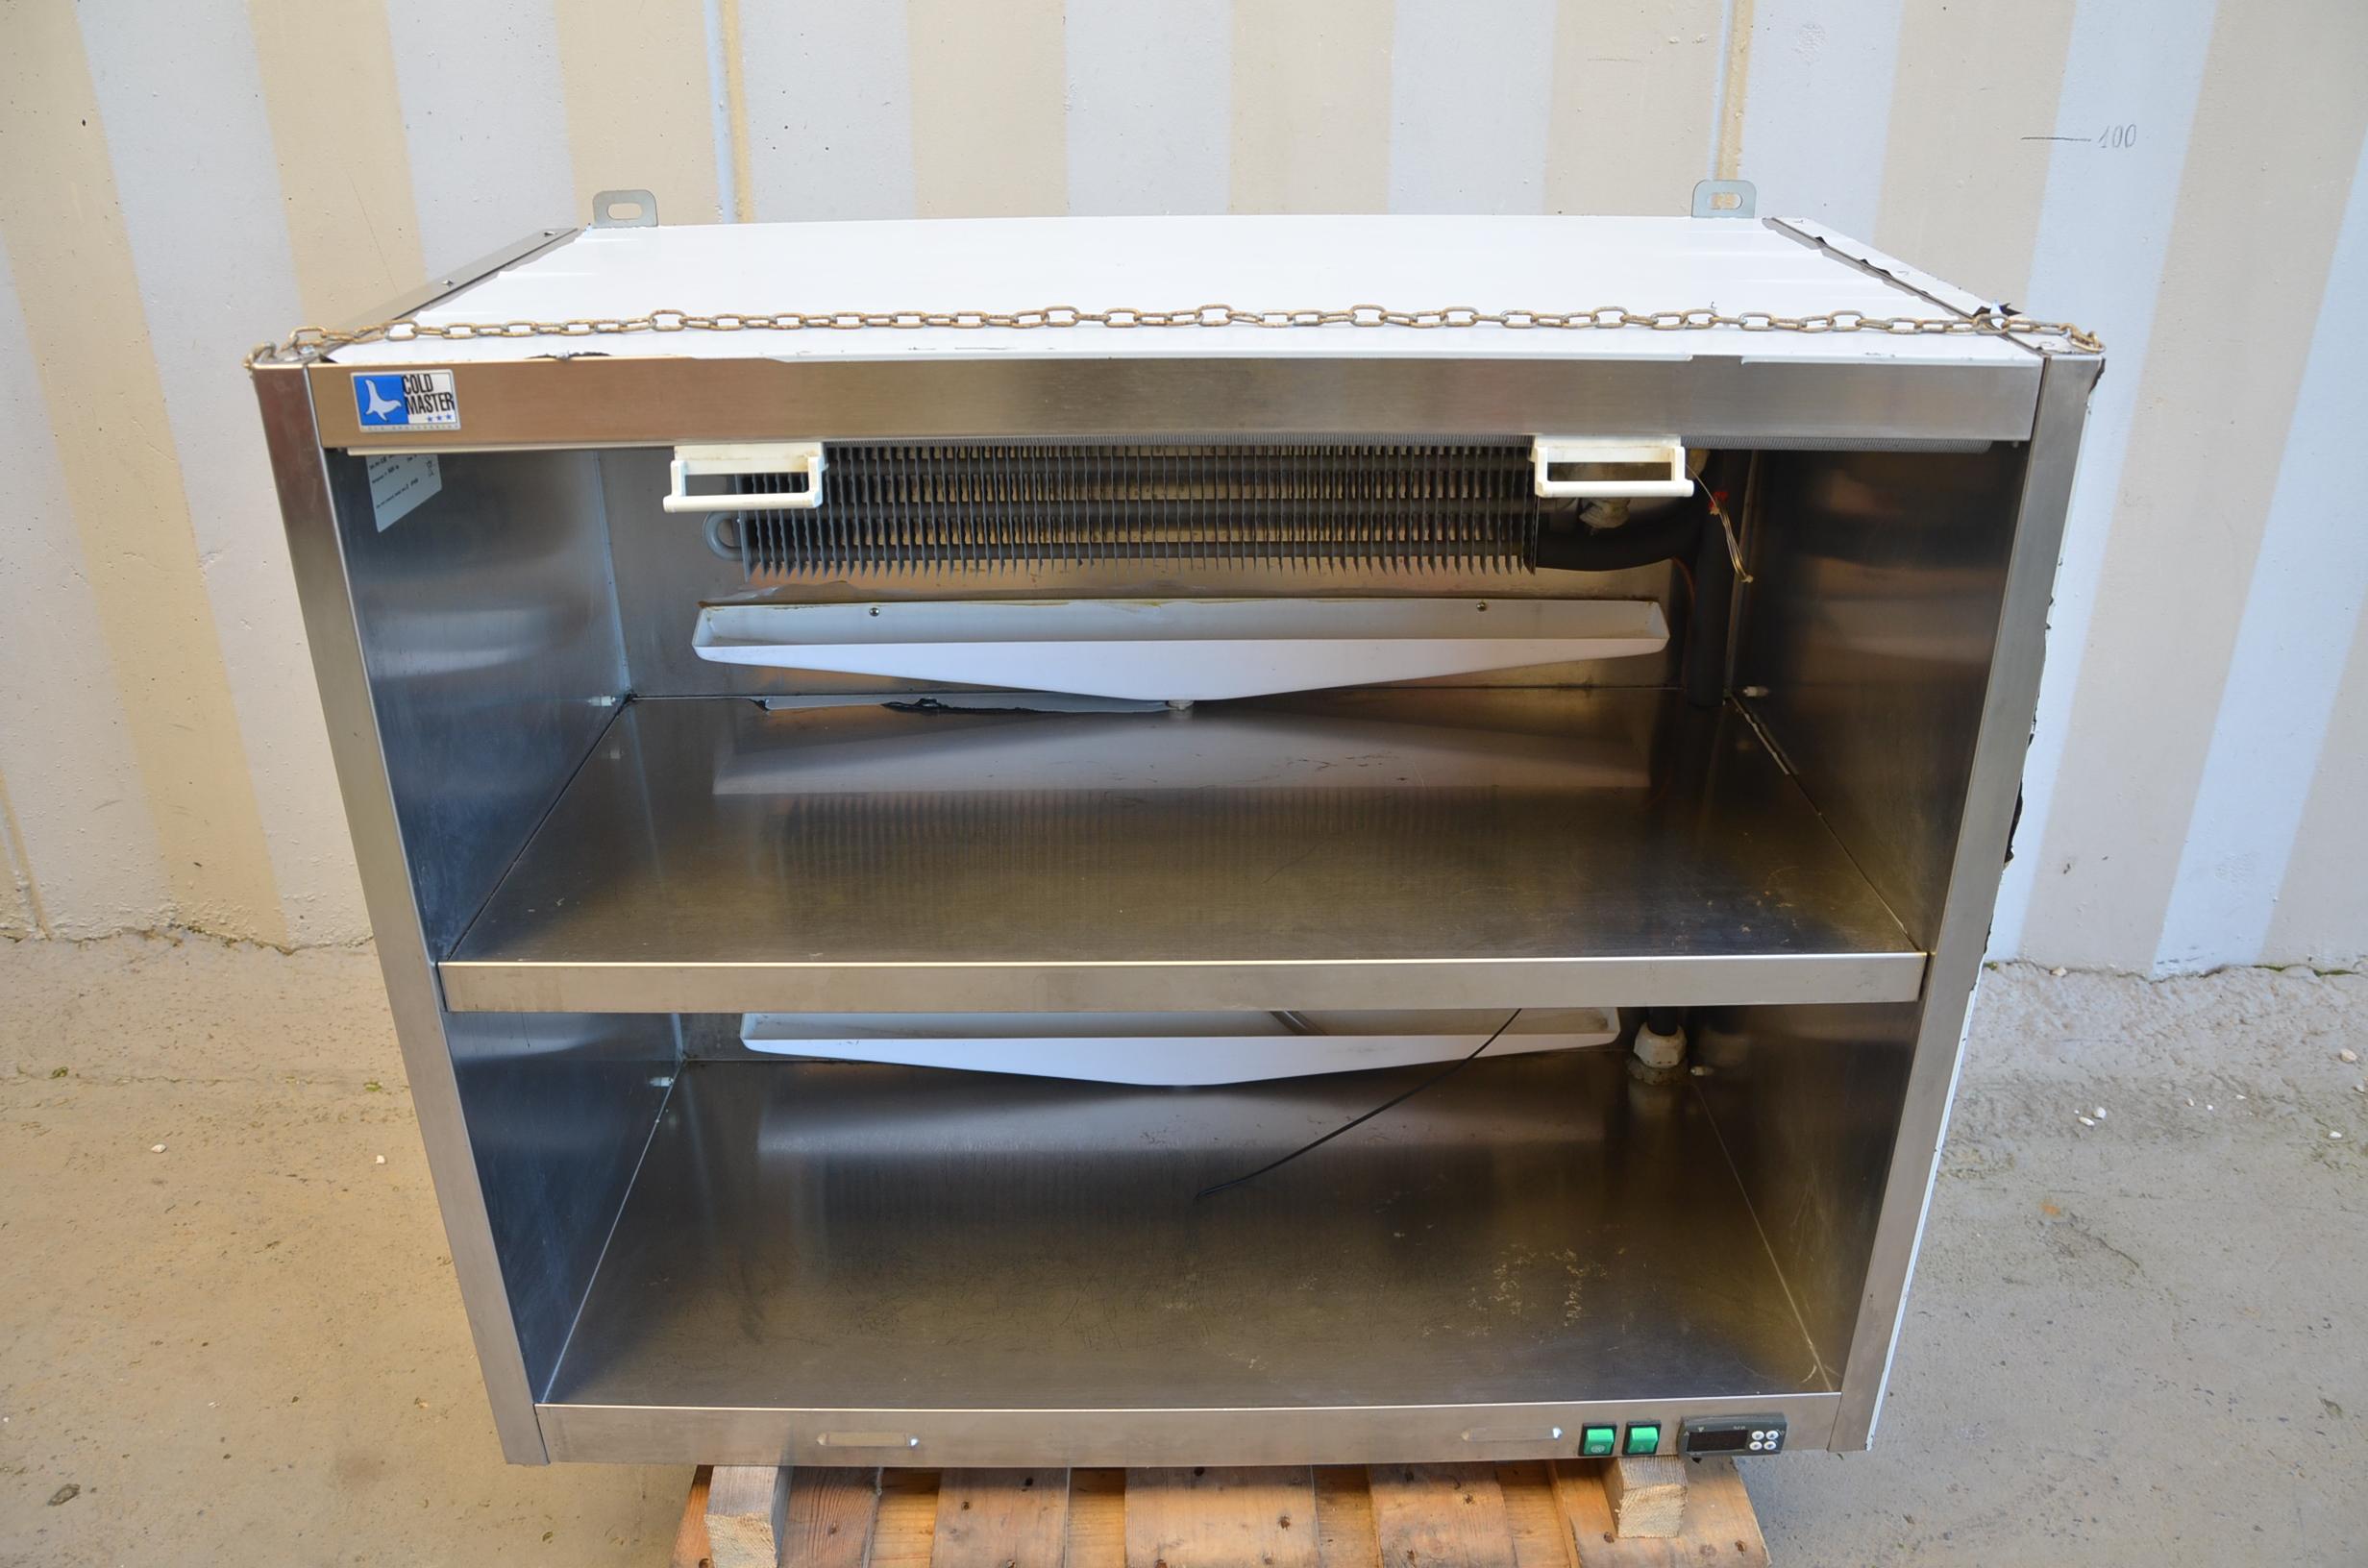 Pensile refrigerato senza gruppo frigo - Tecfrigo in vendita - foto 3